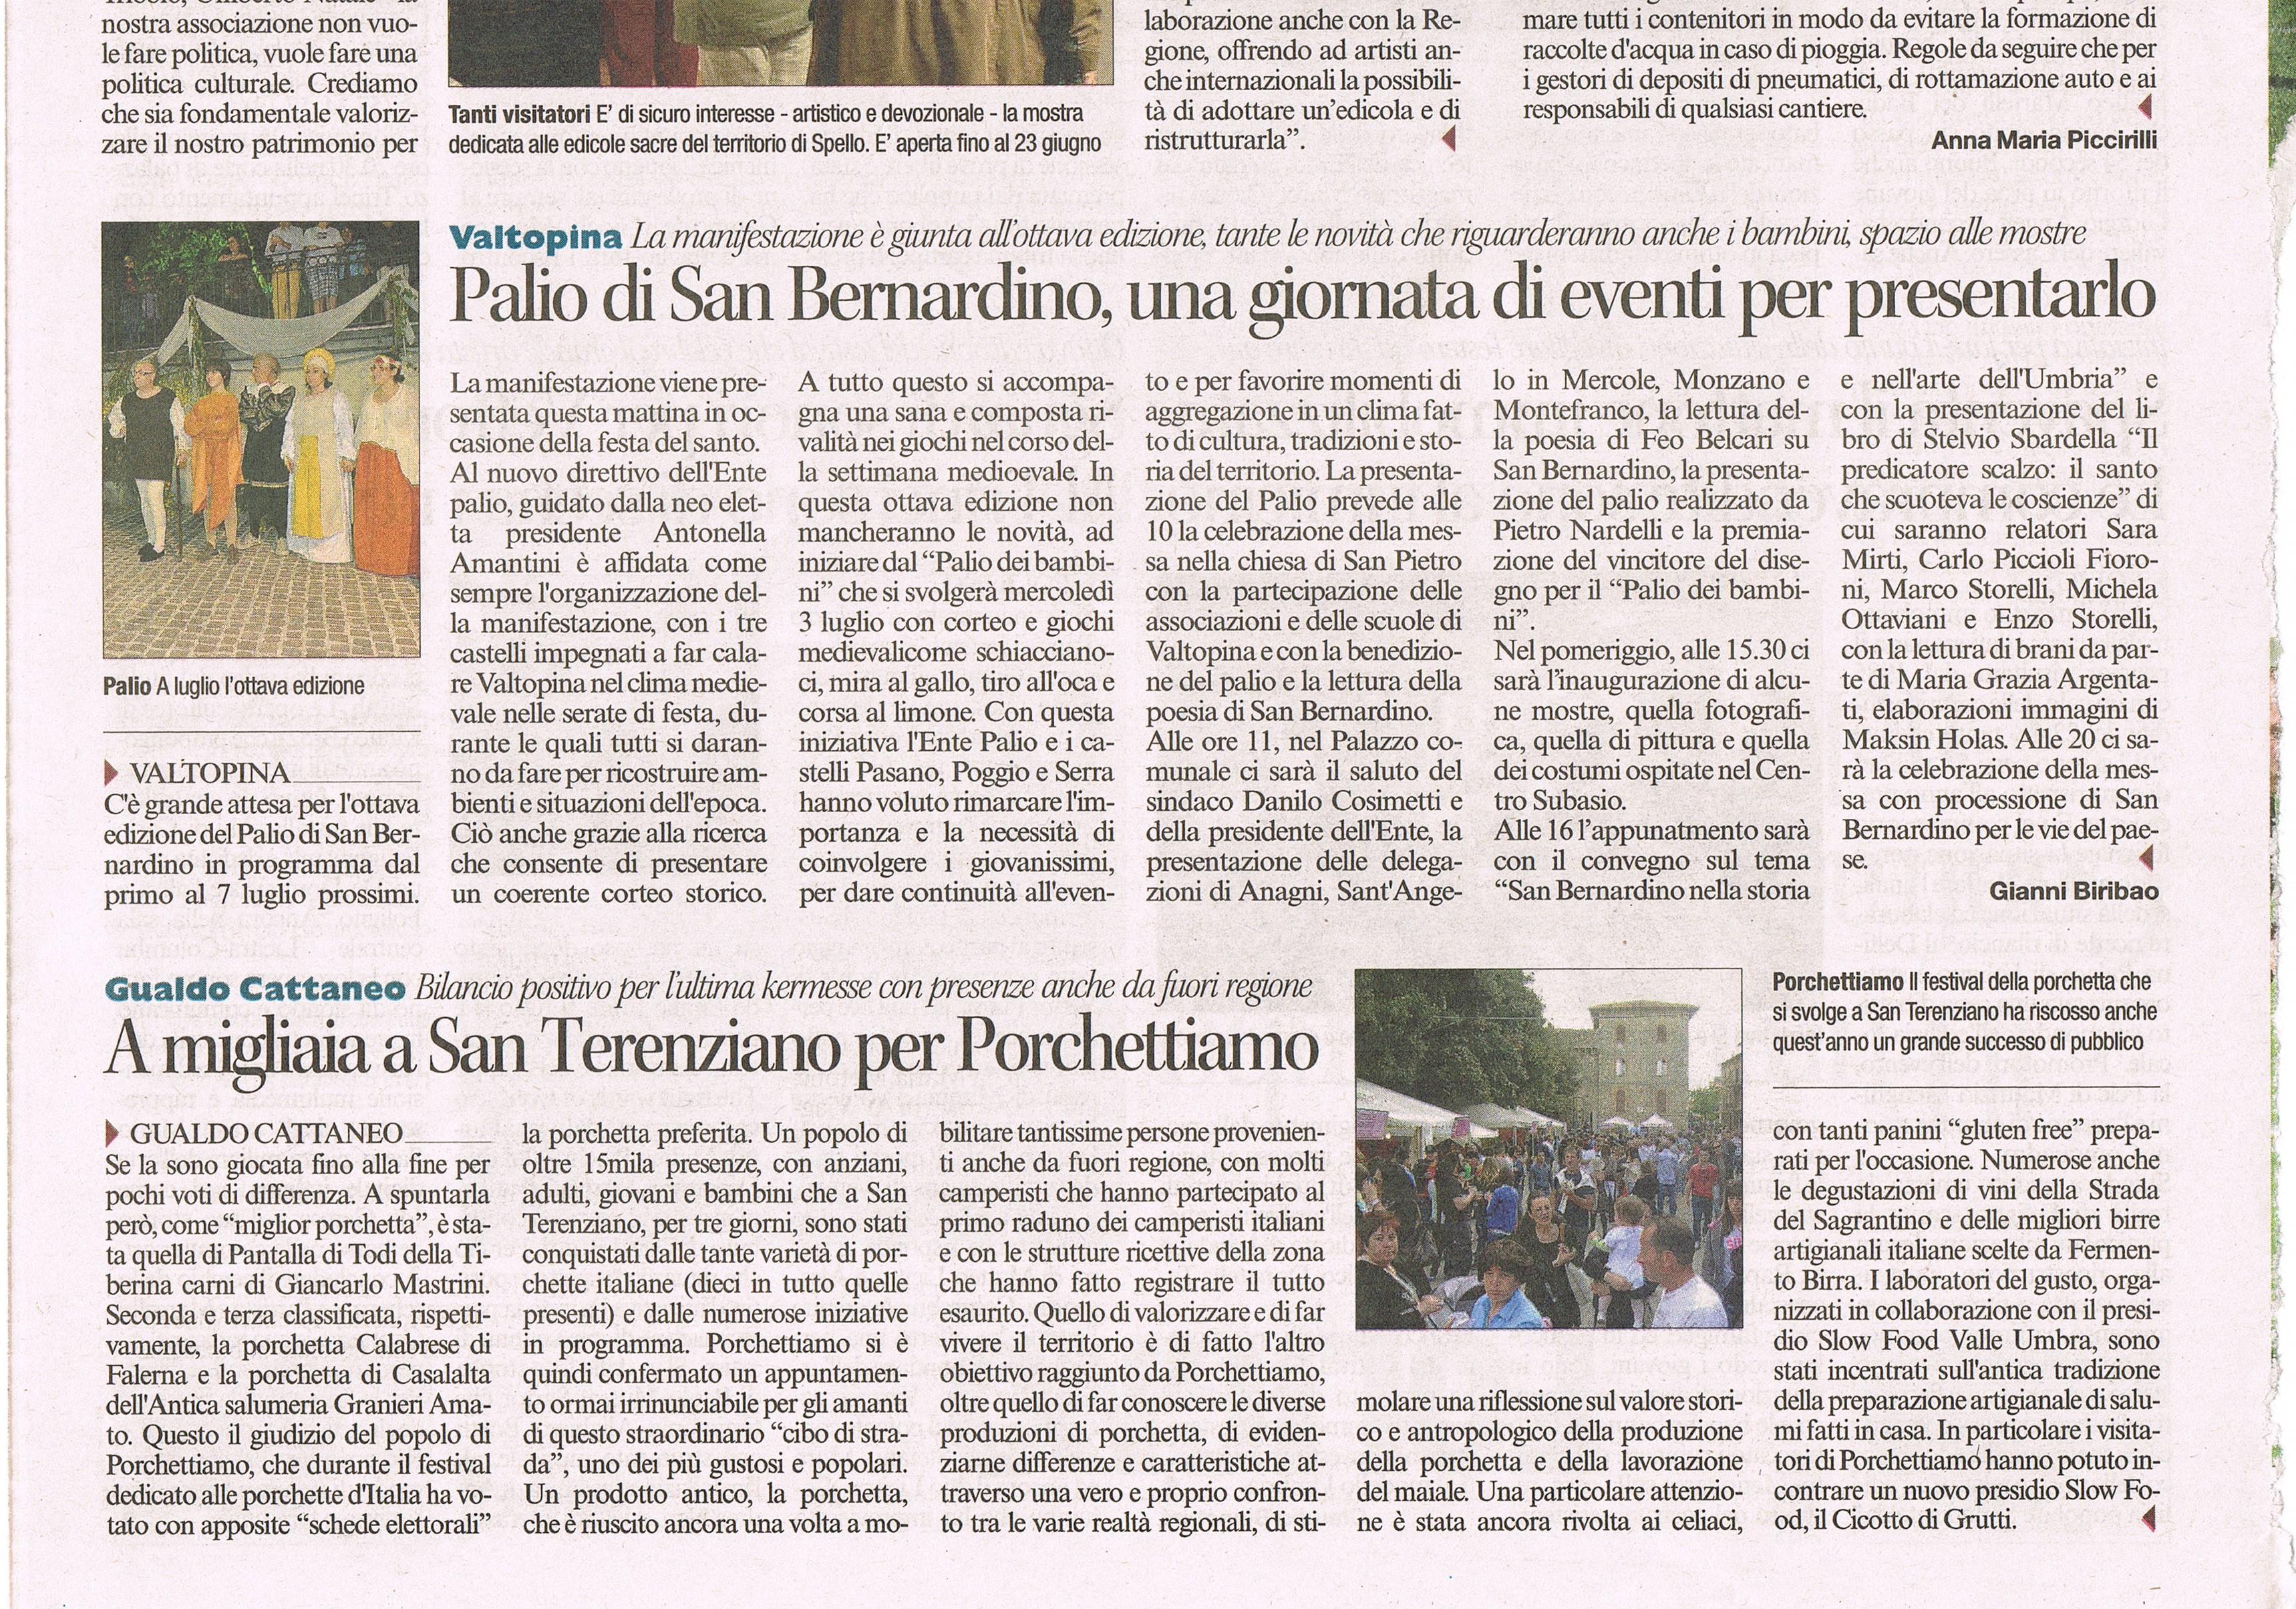 Corriere dell'Umbria 2013